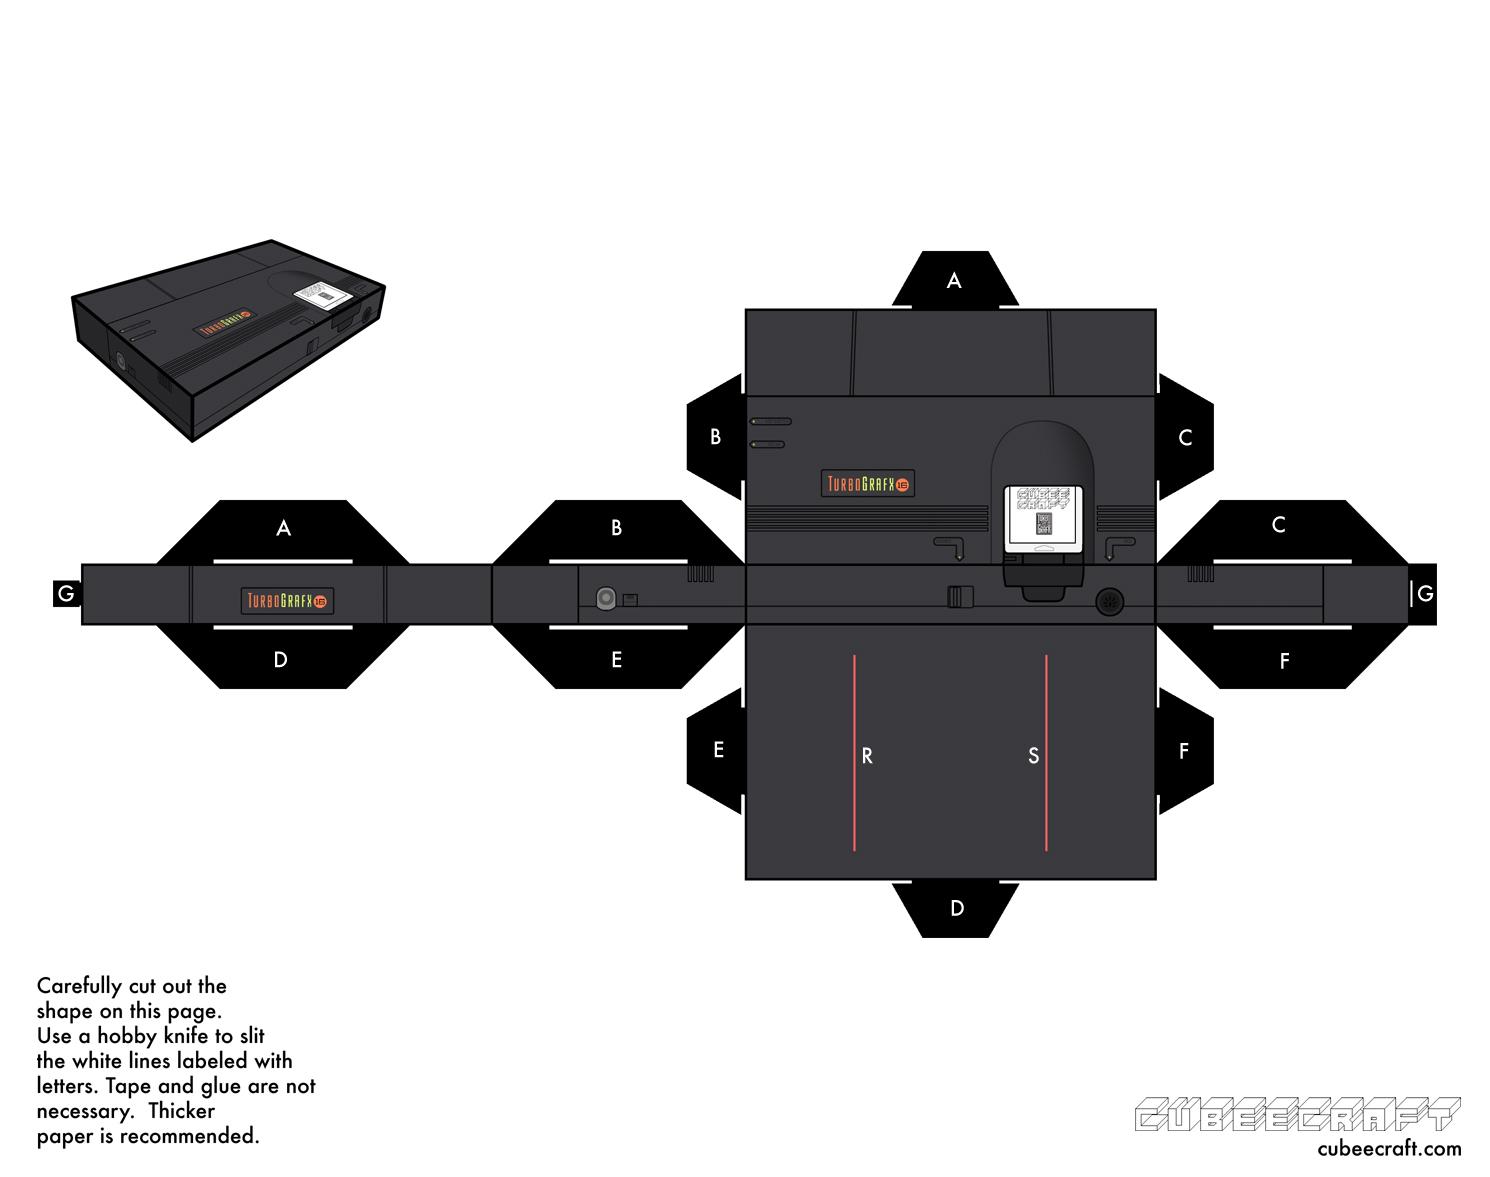 Tg 16 Cubee Craft Tg 16 Com